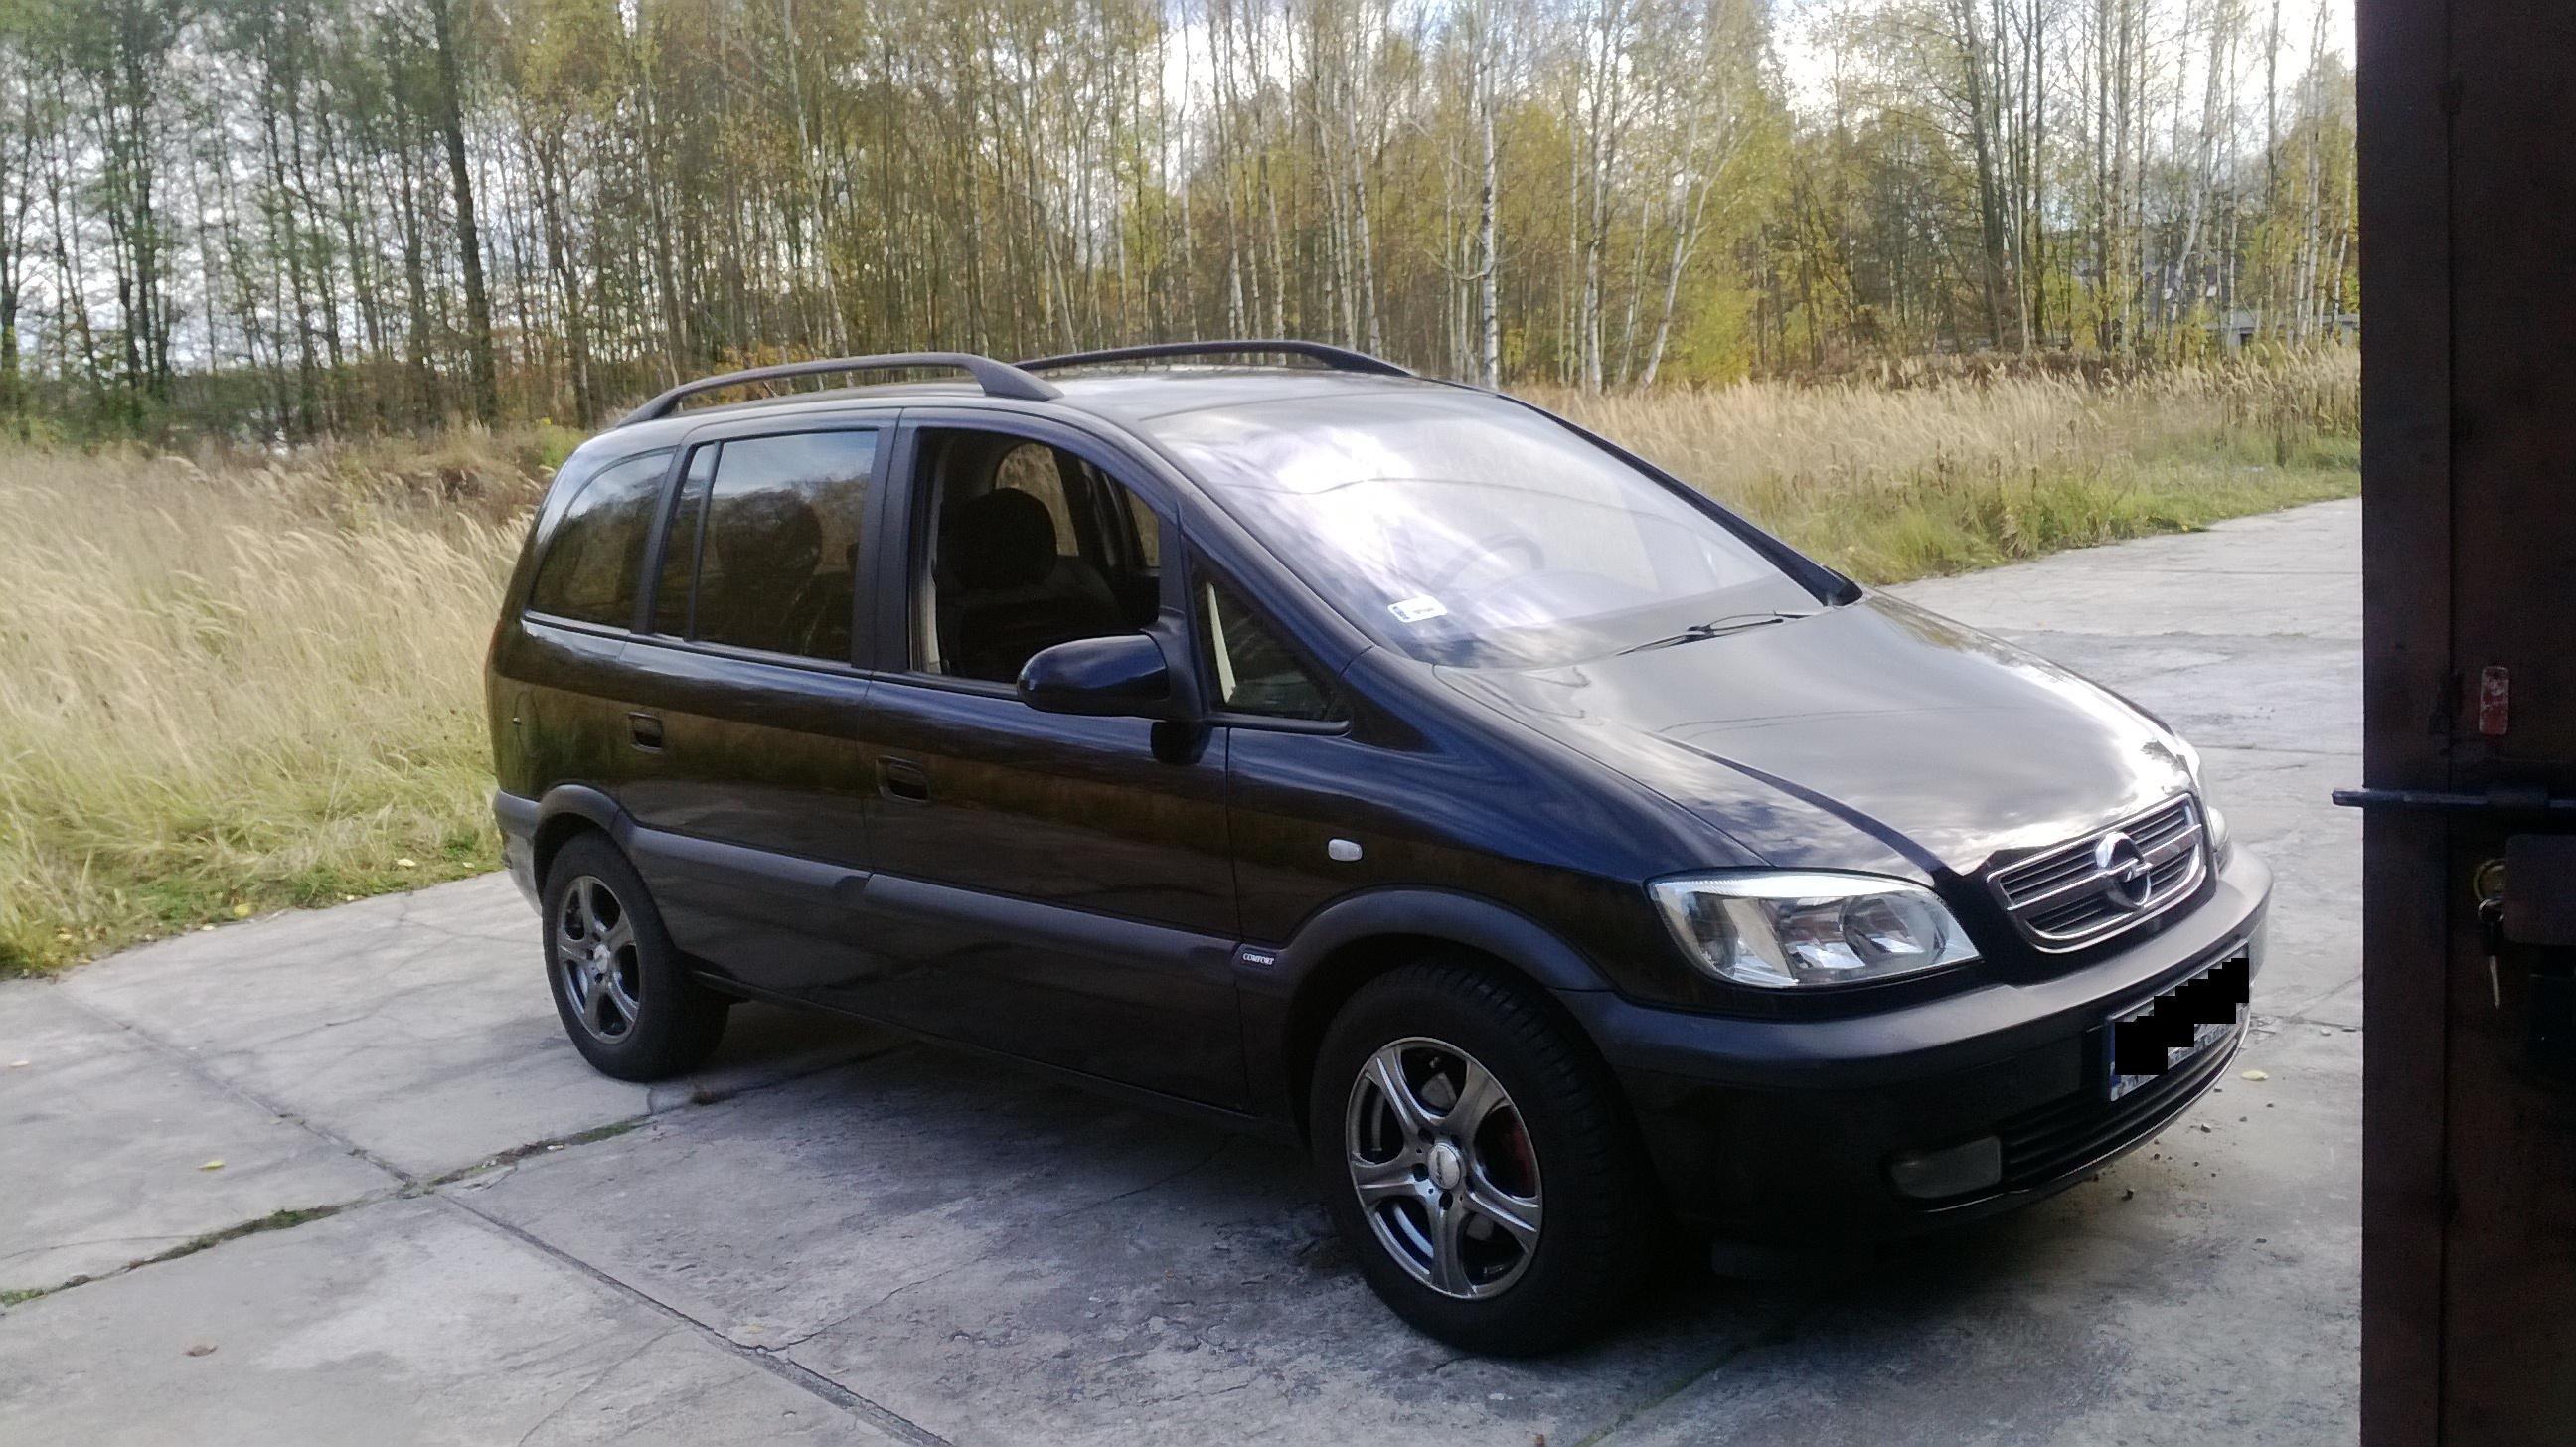 Sprzedam Opel Zafira 2,0 DTi